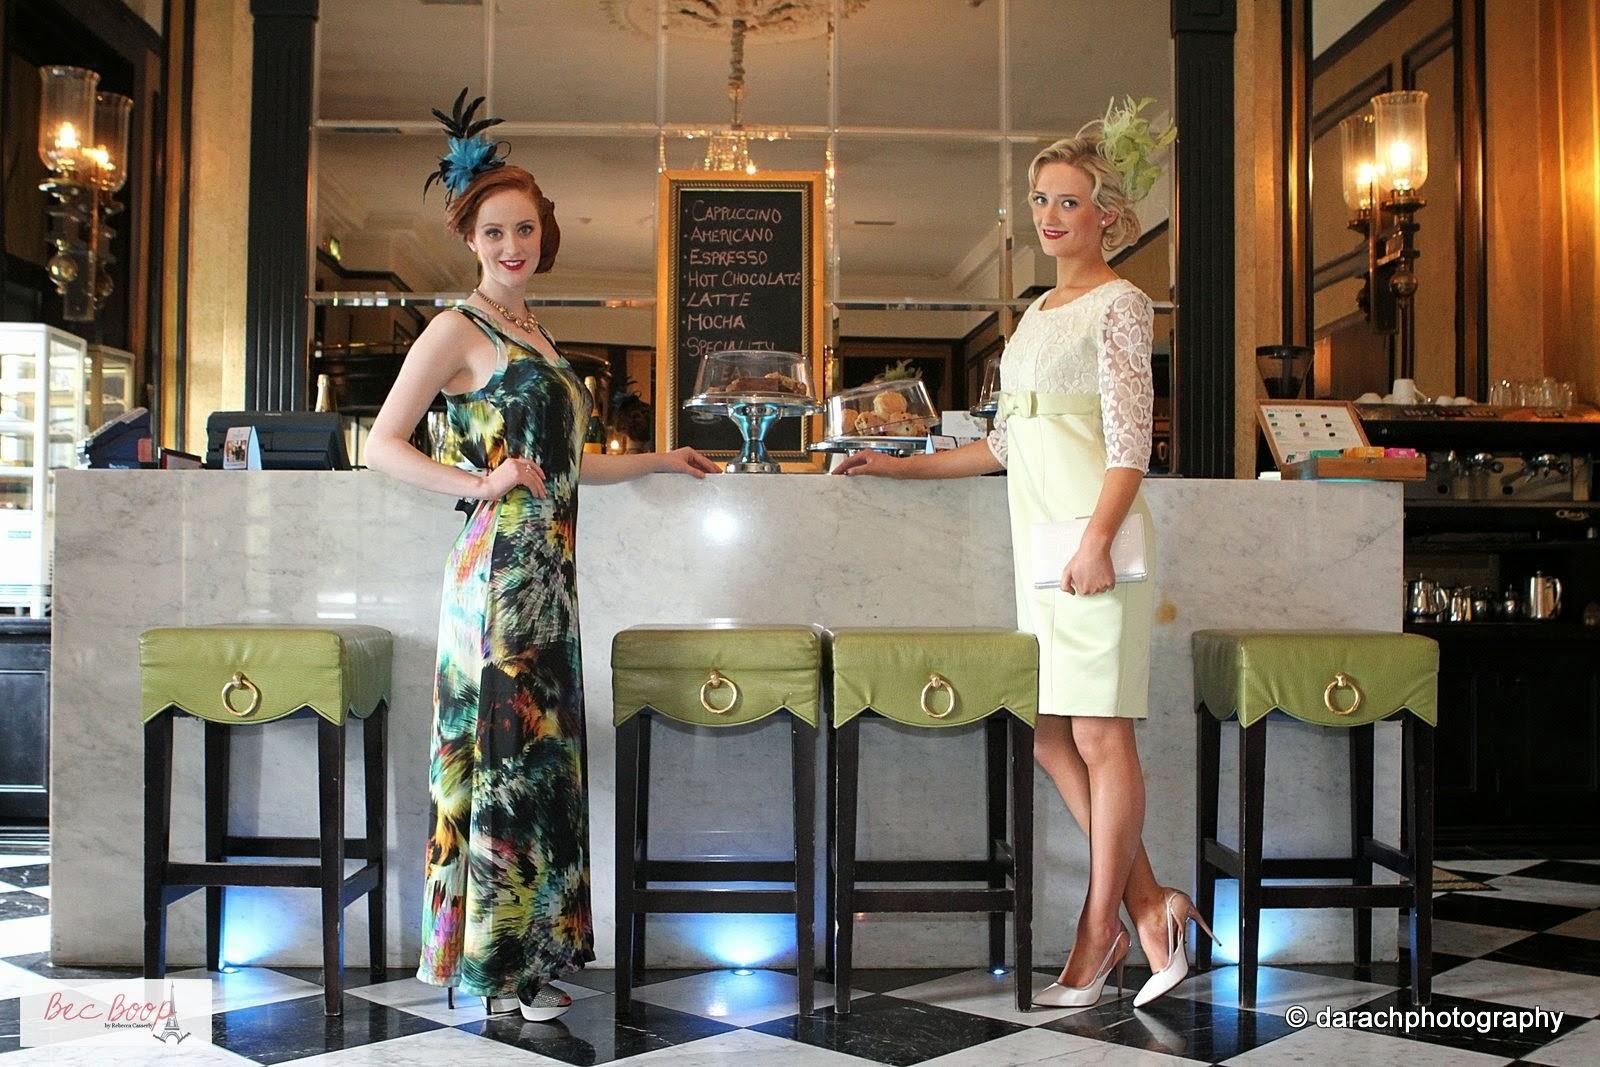 Hotel Meyrick Galway races